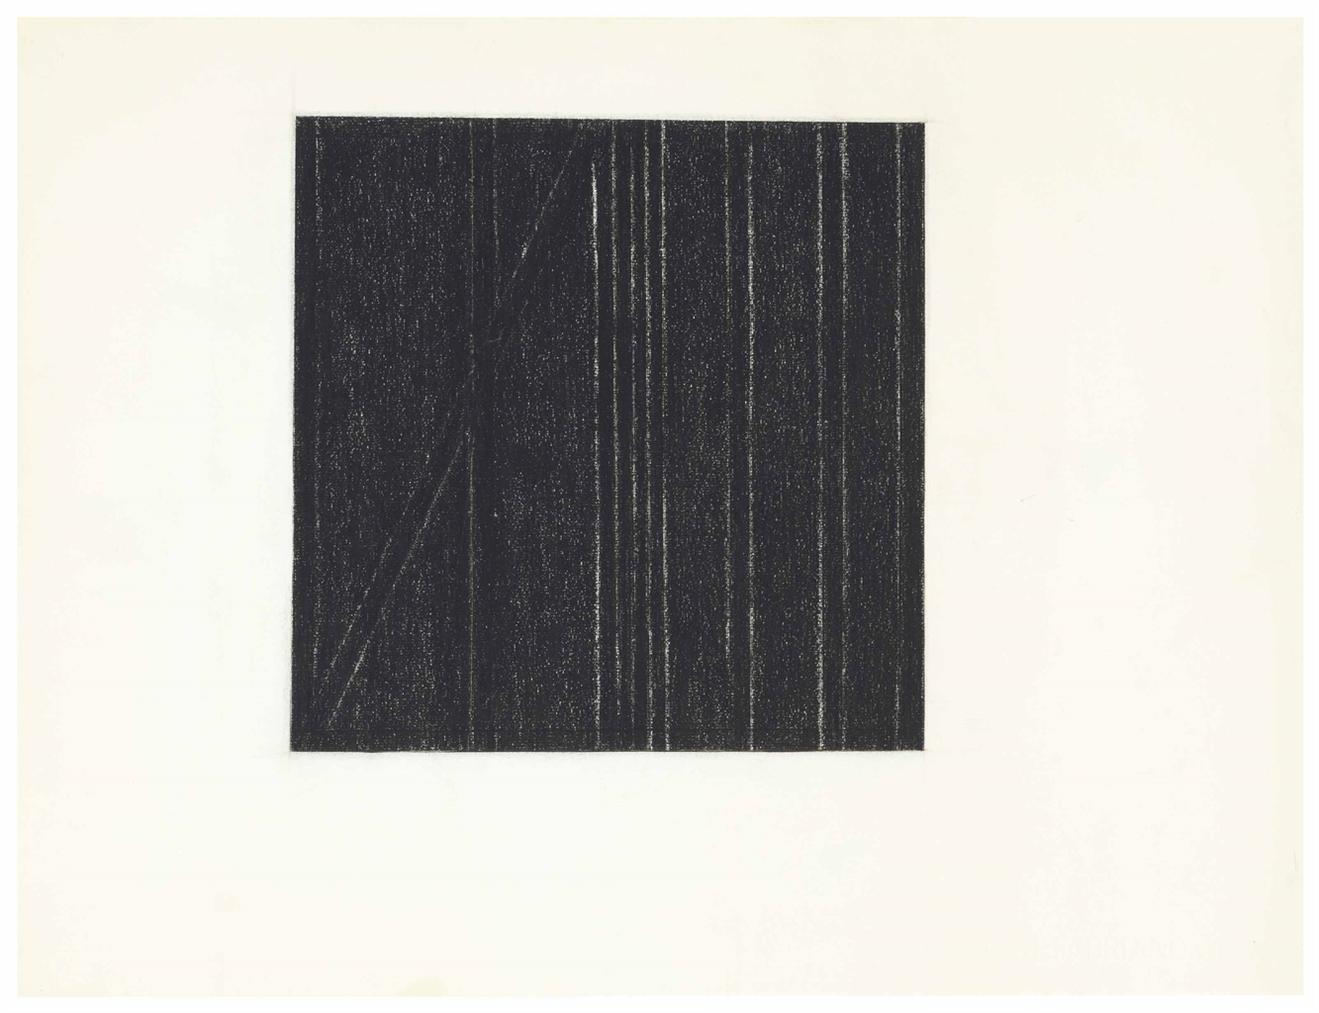 Dorothea Rockburne - Tenebrae-1960